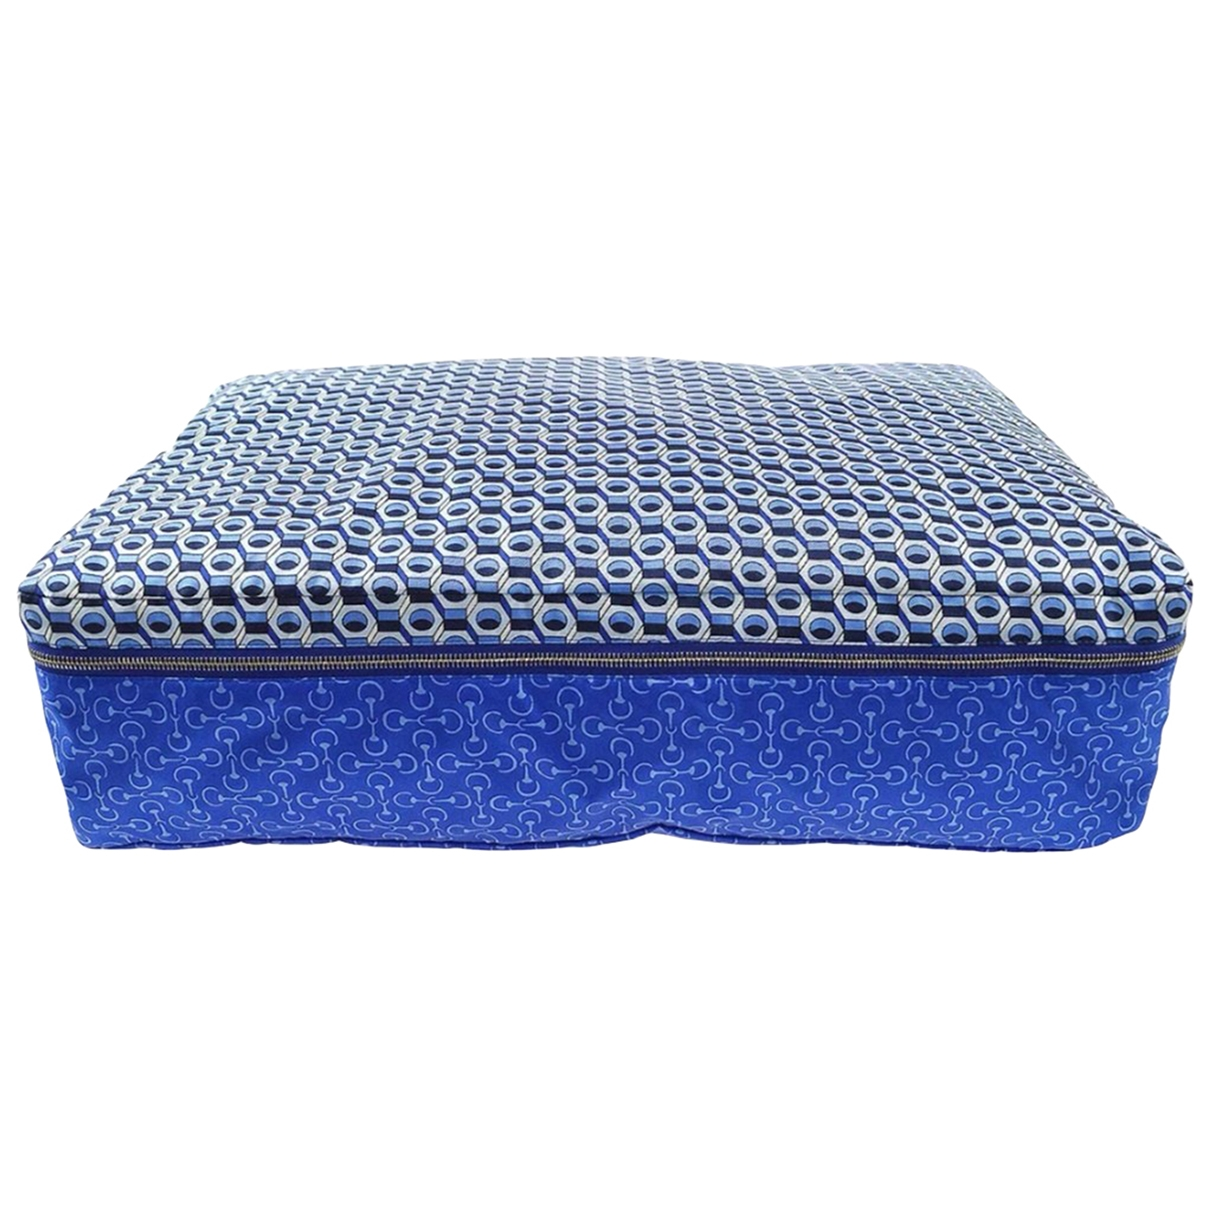 Hermes \N Accessoires und Dekoration in  Blau Seide